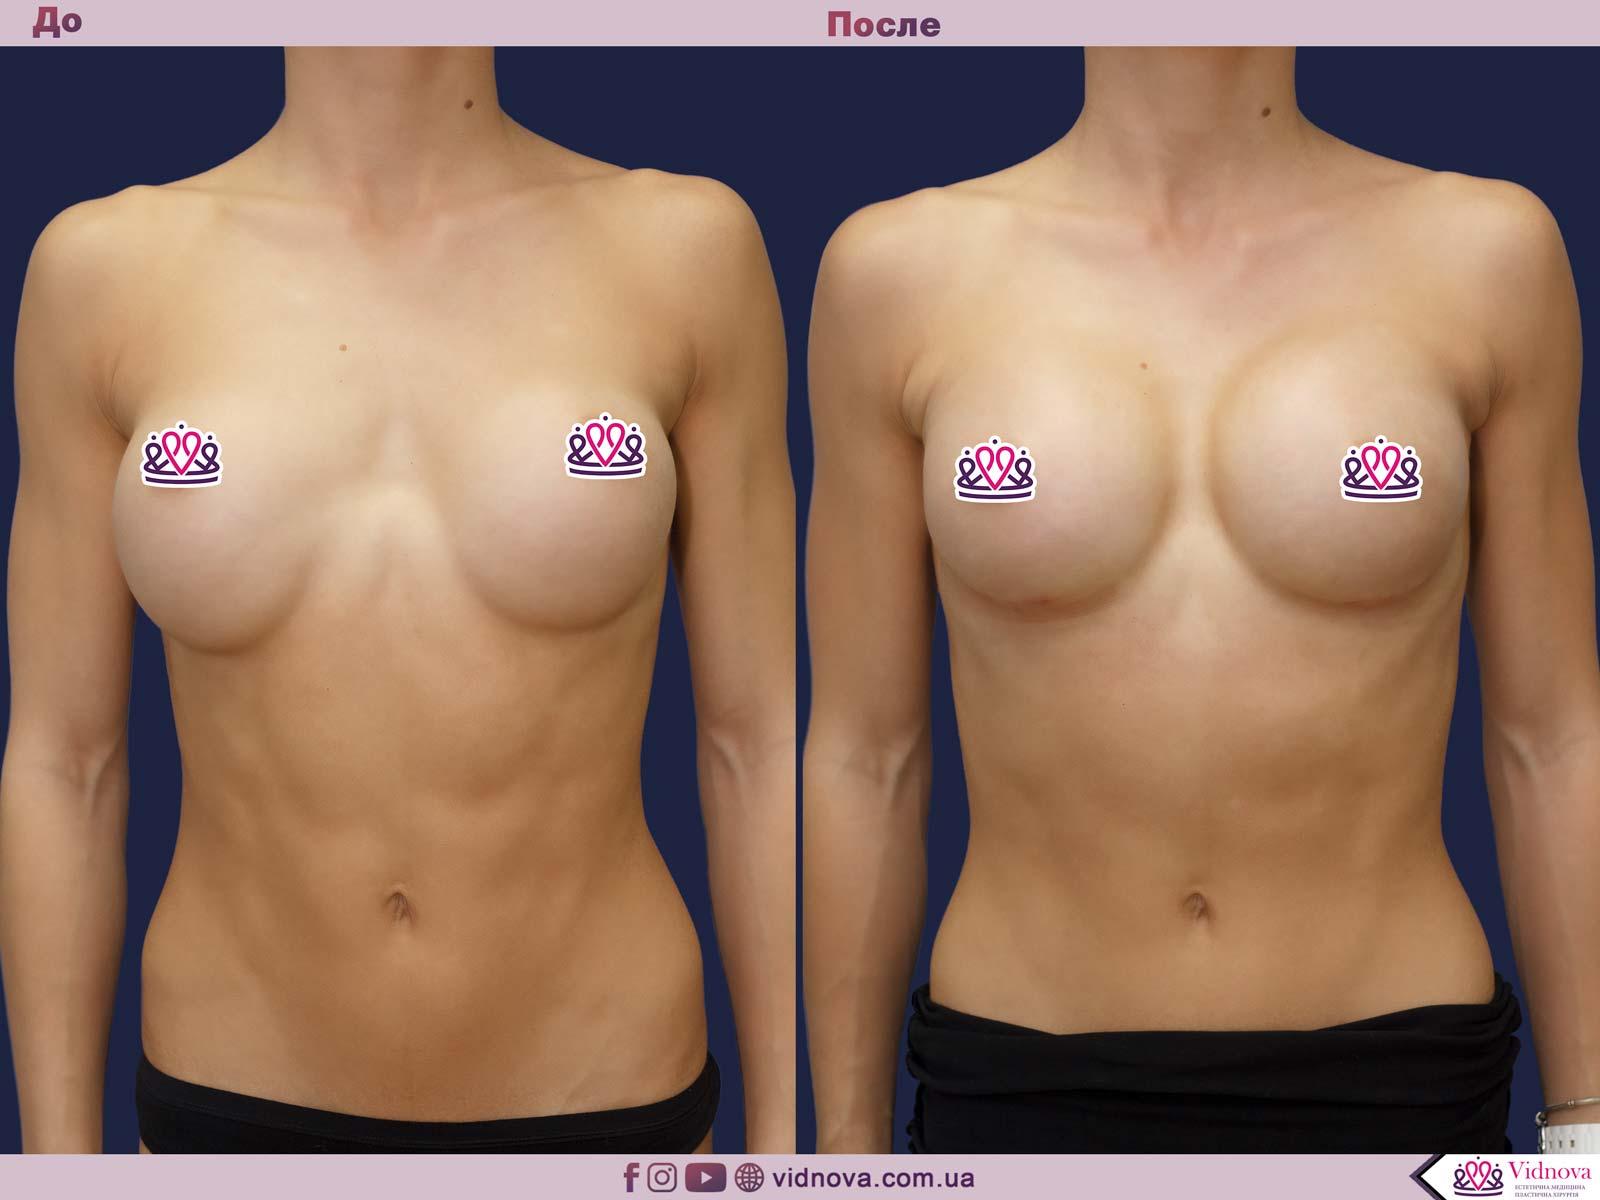 Увеличение груди: Фото ДО и ПОСЛЕ - Пример №64-1 - Клиника Vidnova